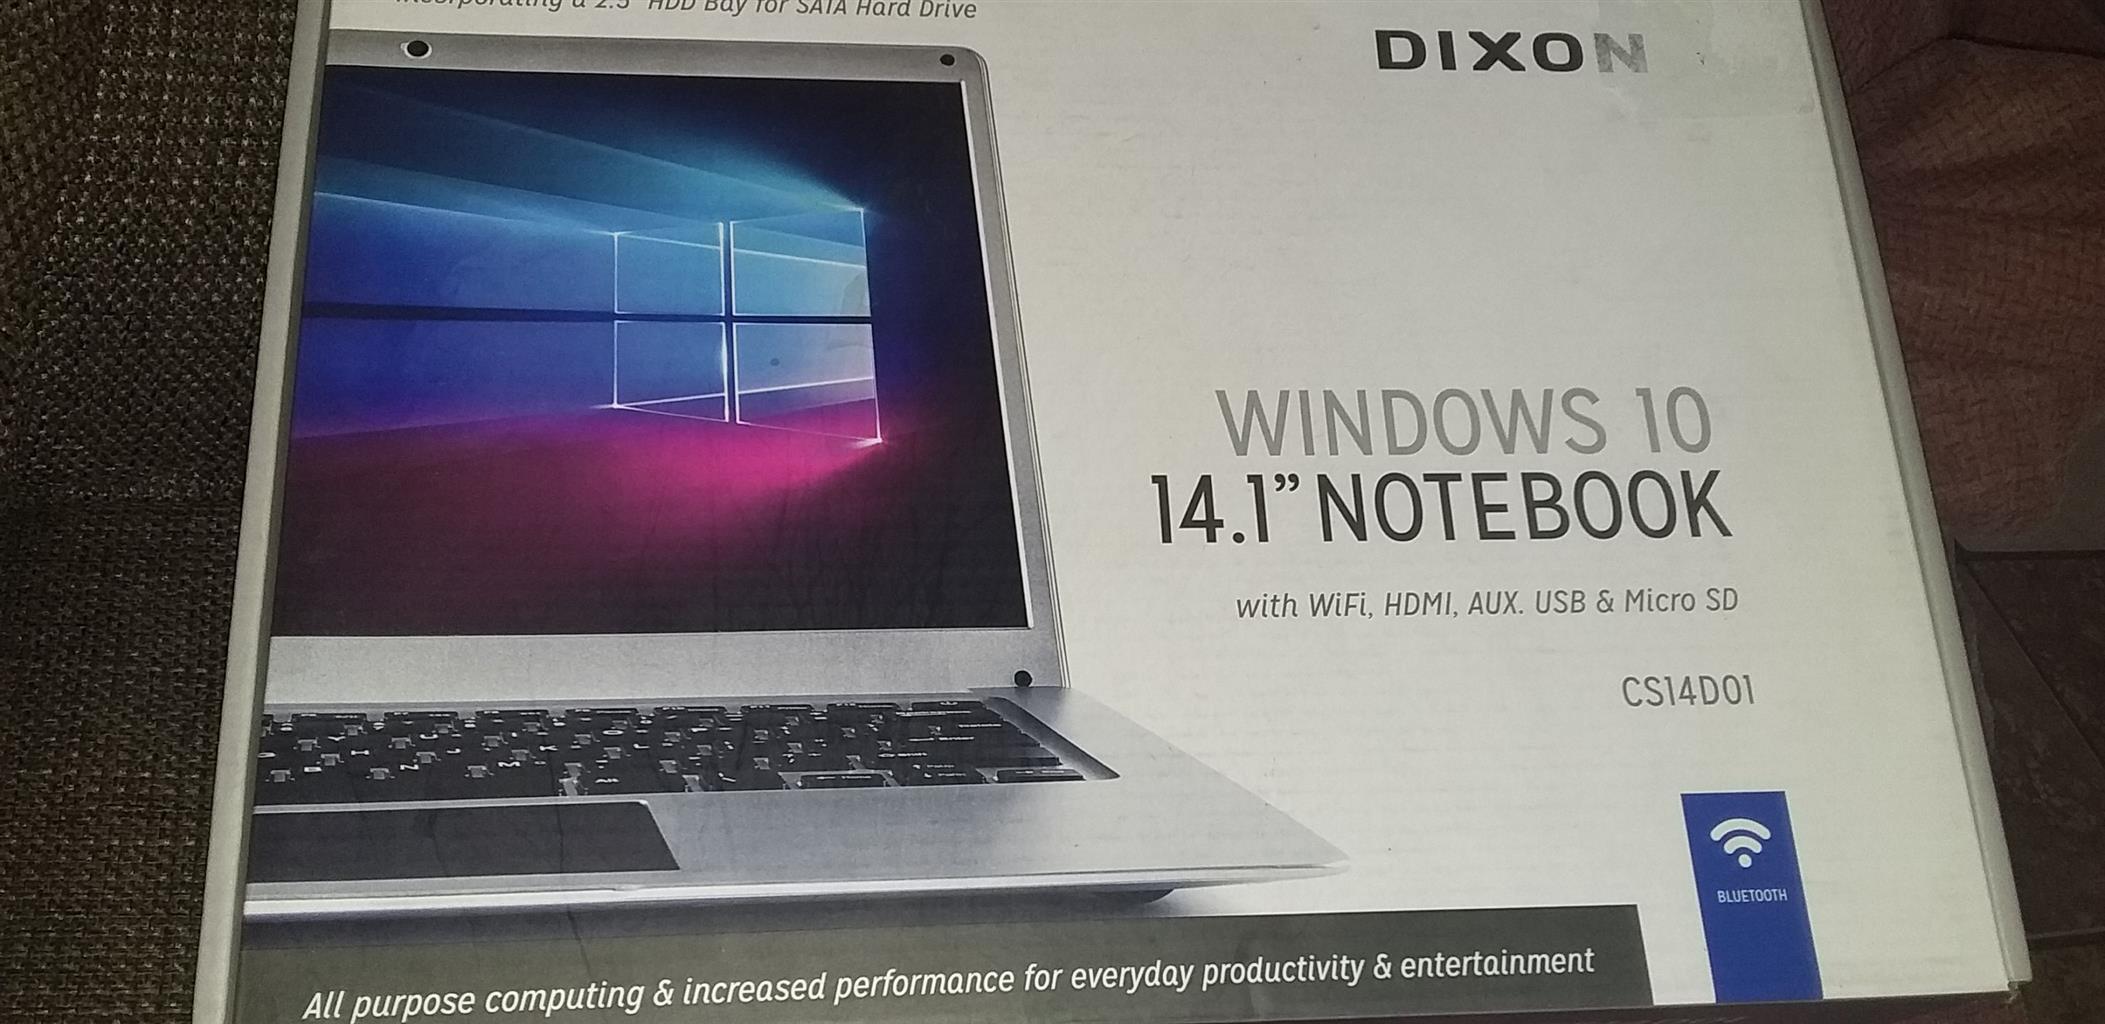 Dixon Notebook and Canon Printer combo